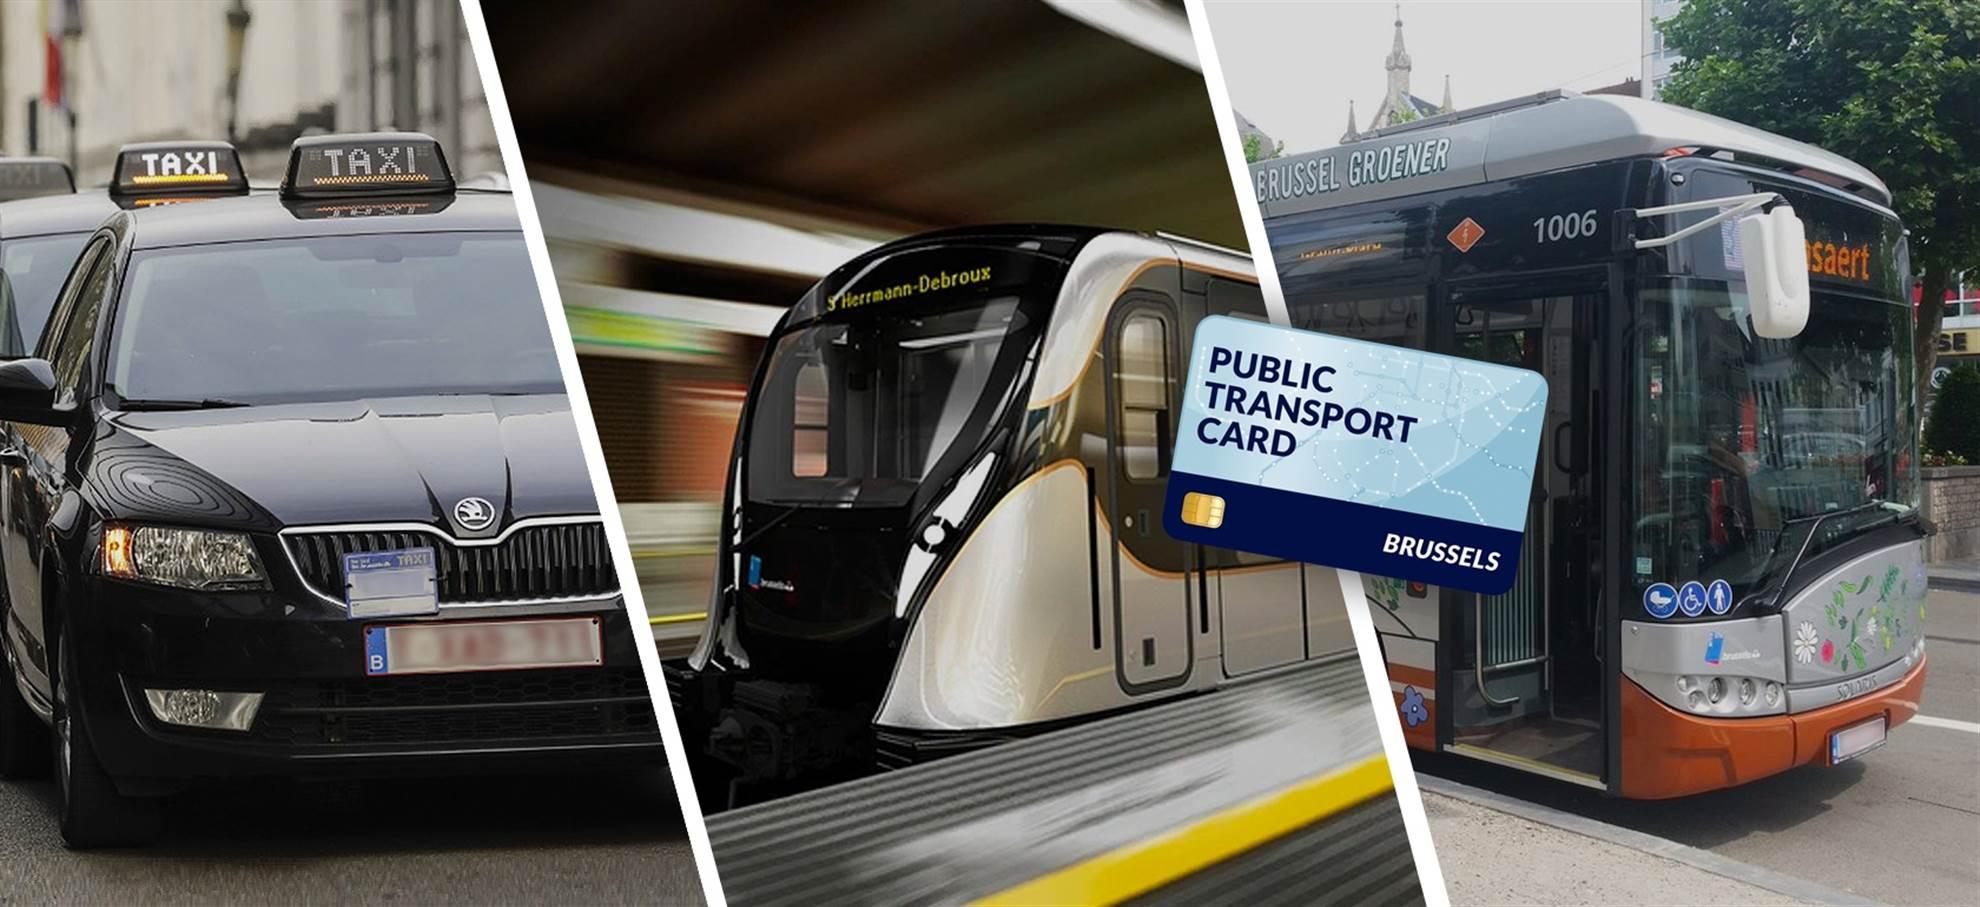 Brussels Public Transportation Card (+Airport Transfer)